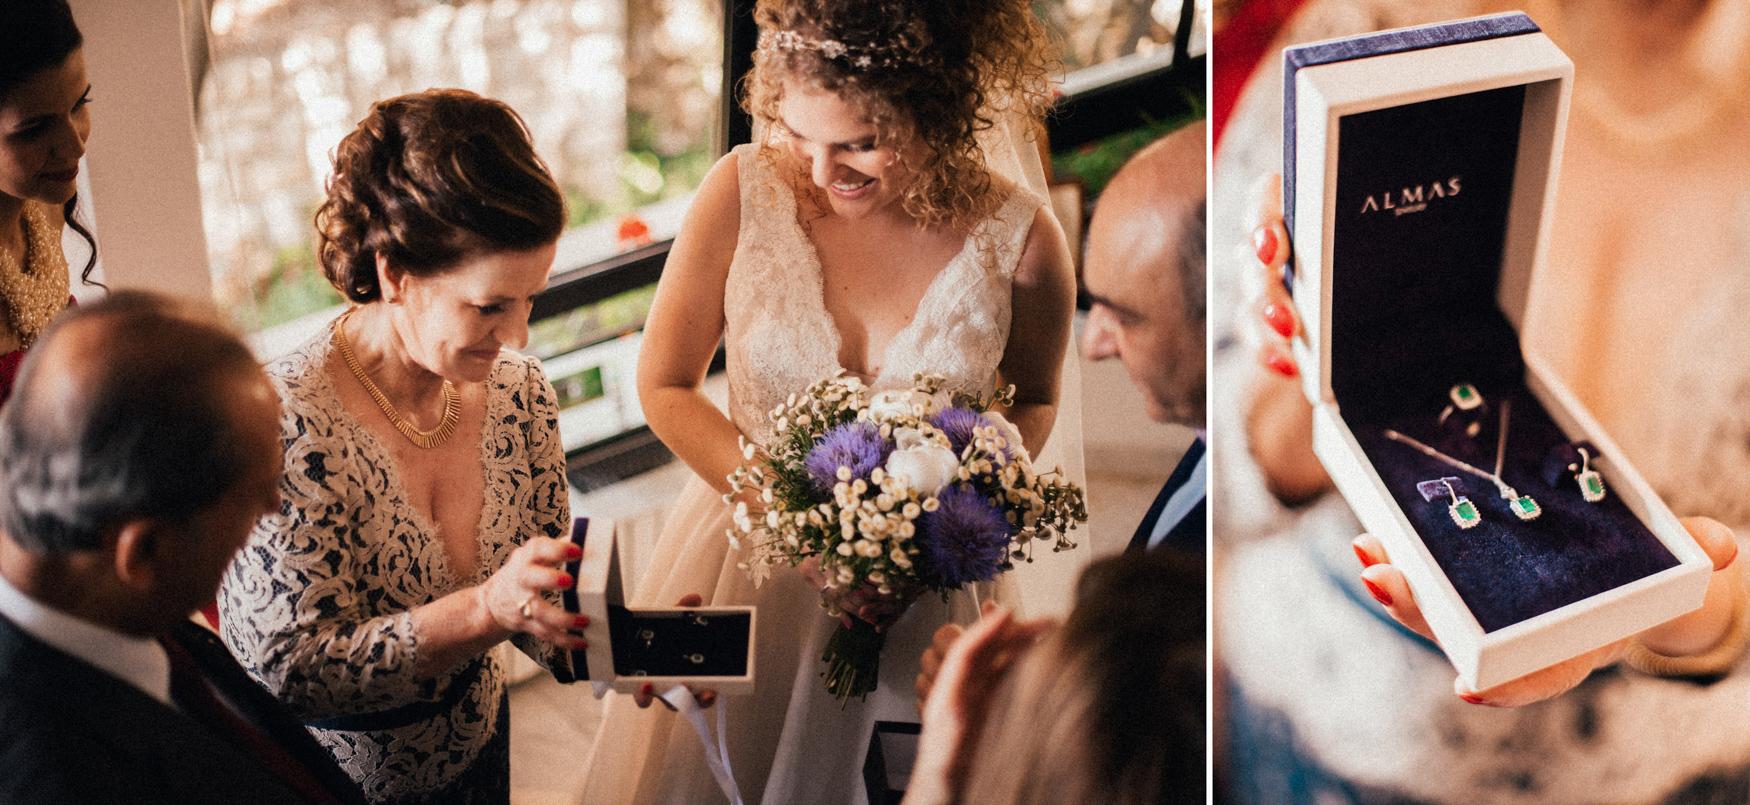 LR2 beirut byblos wedding photographer lebanon 029.jpg